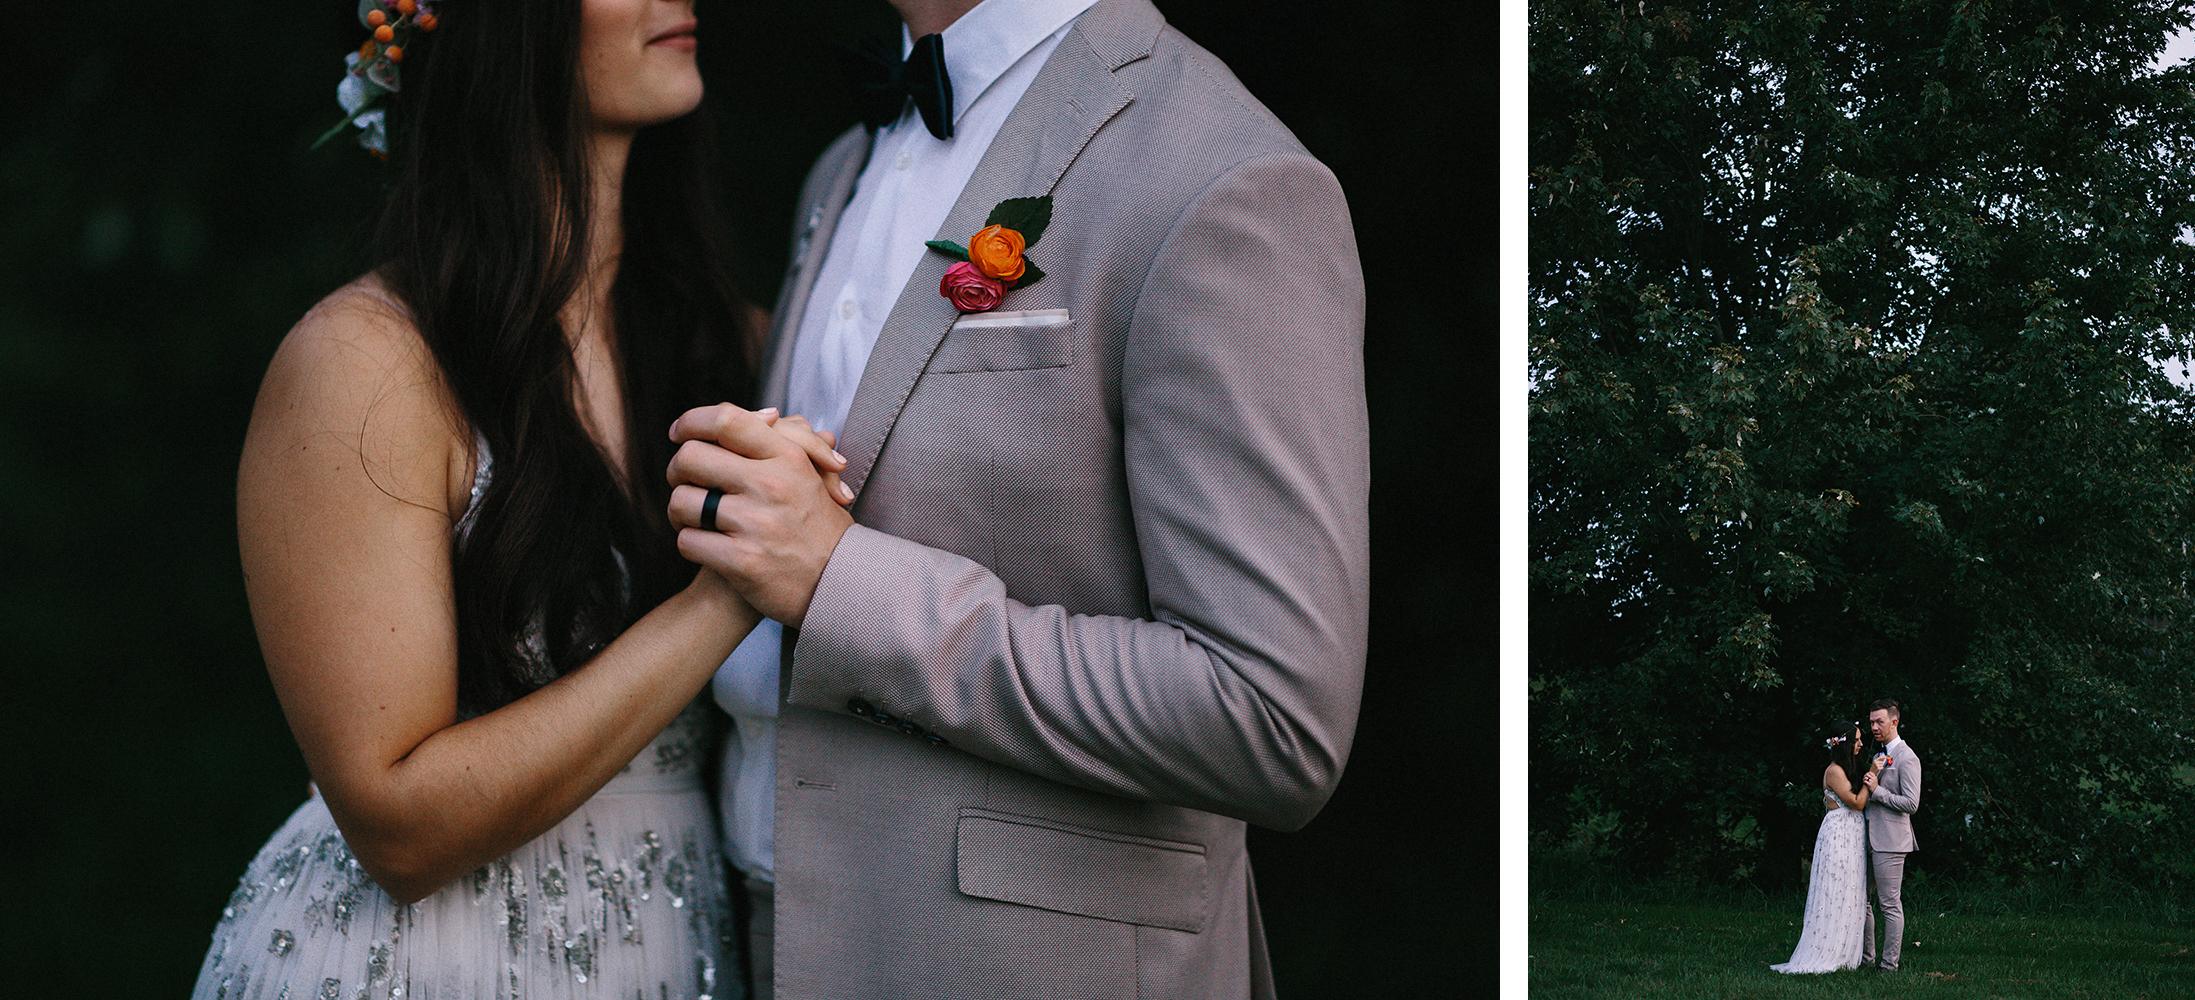 31-Backyard-toronto-film-photographer-ryanne-hollies-photography-analog-photography-torontos-best-wedding-photographers-night-portraits-bride-and-groom-candid-intimate-moody-dark-romantic-under-tree-trendy.jpg